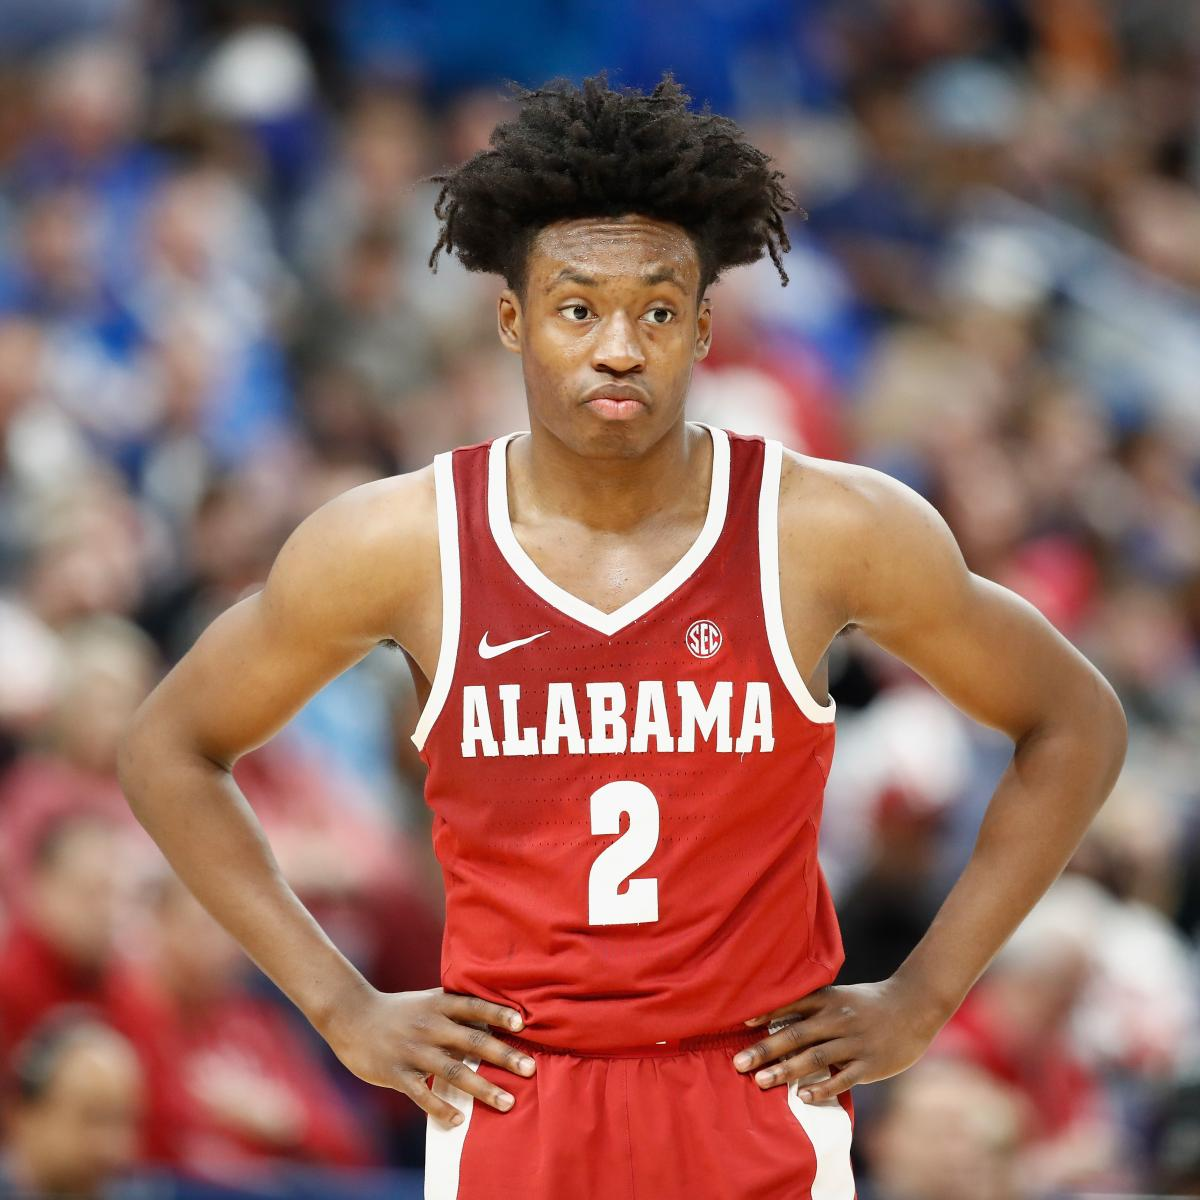 Alabama Crimson Tide vs. Virginia Tech Hokies Odds, March Madness Betting Pick